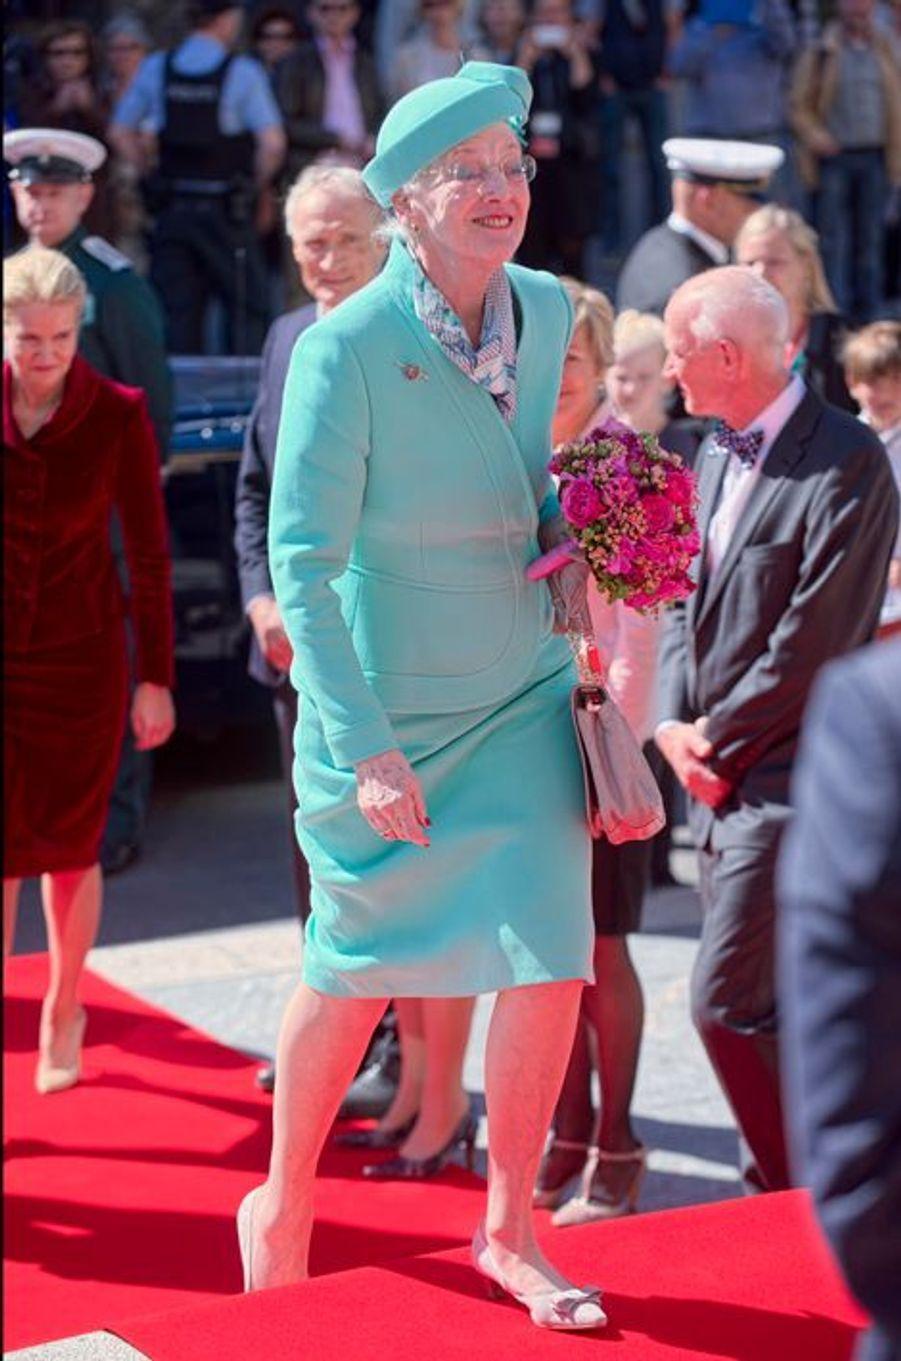 La reine Margrethe II de Danemark à Copenhague, le 5 juin 2015